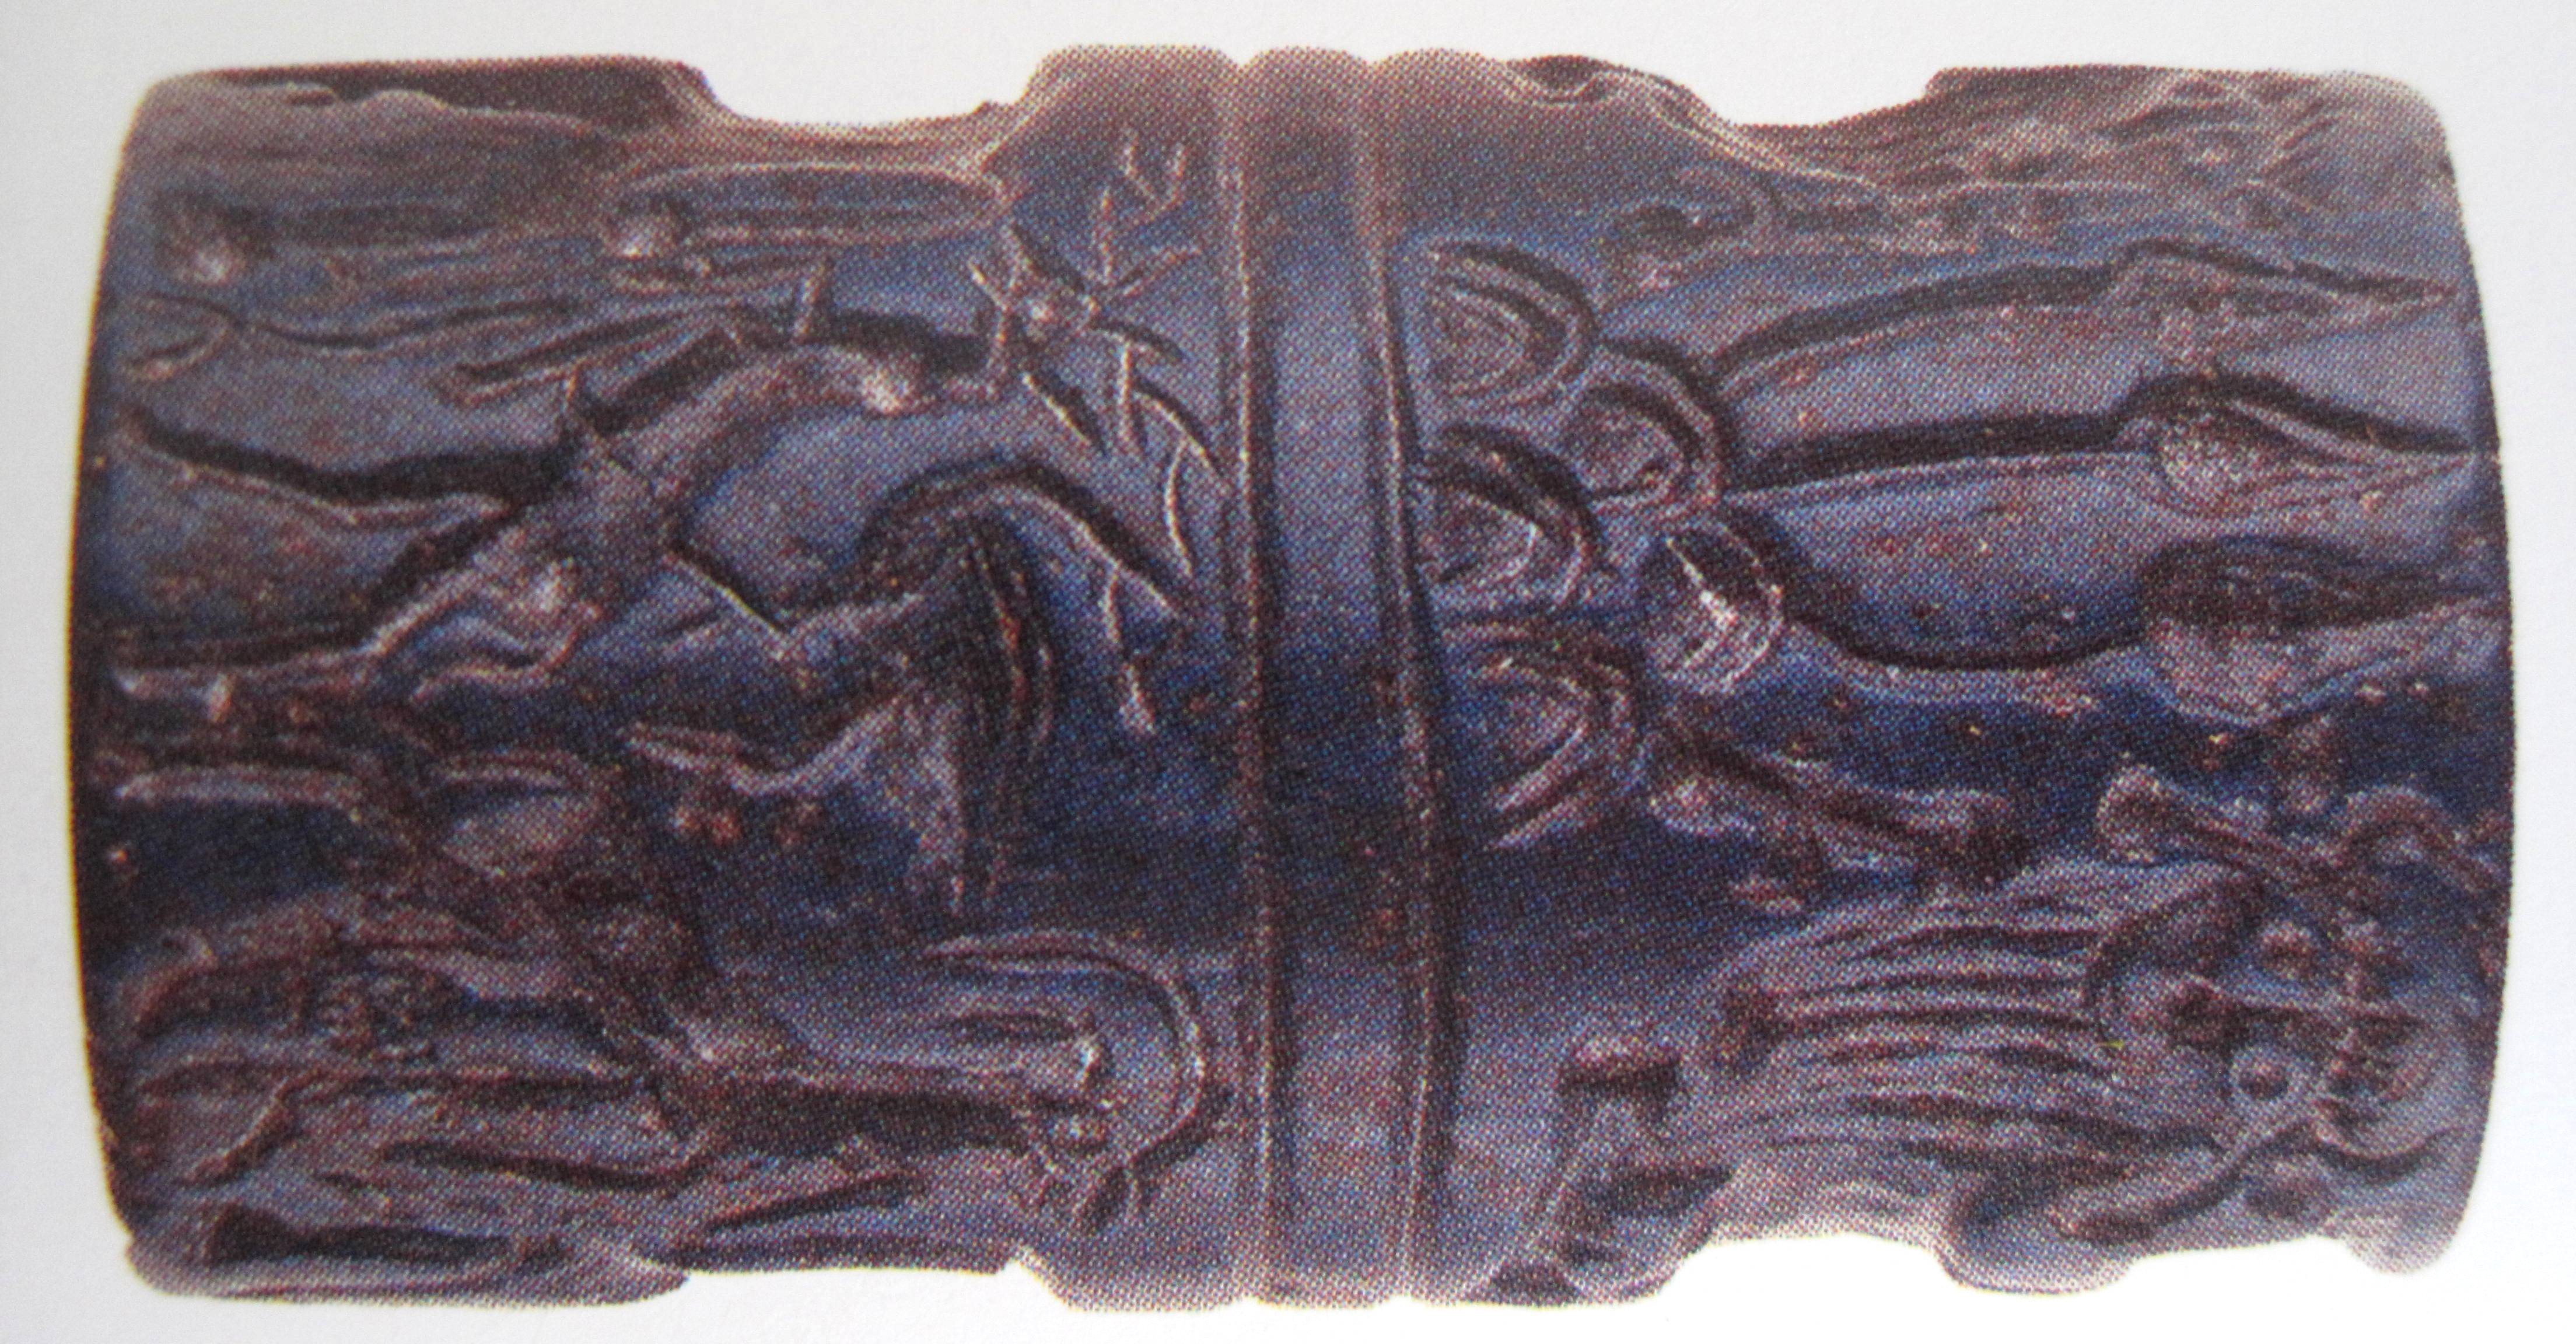 Rolzegel van Lapis Lazuli